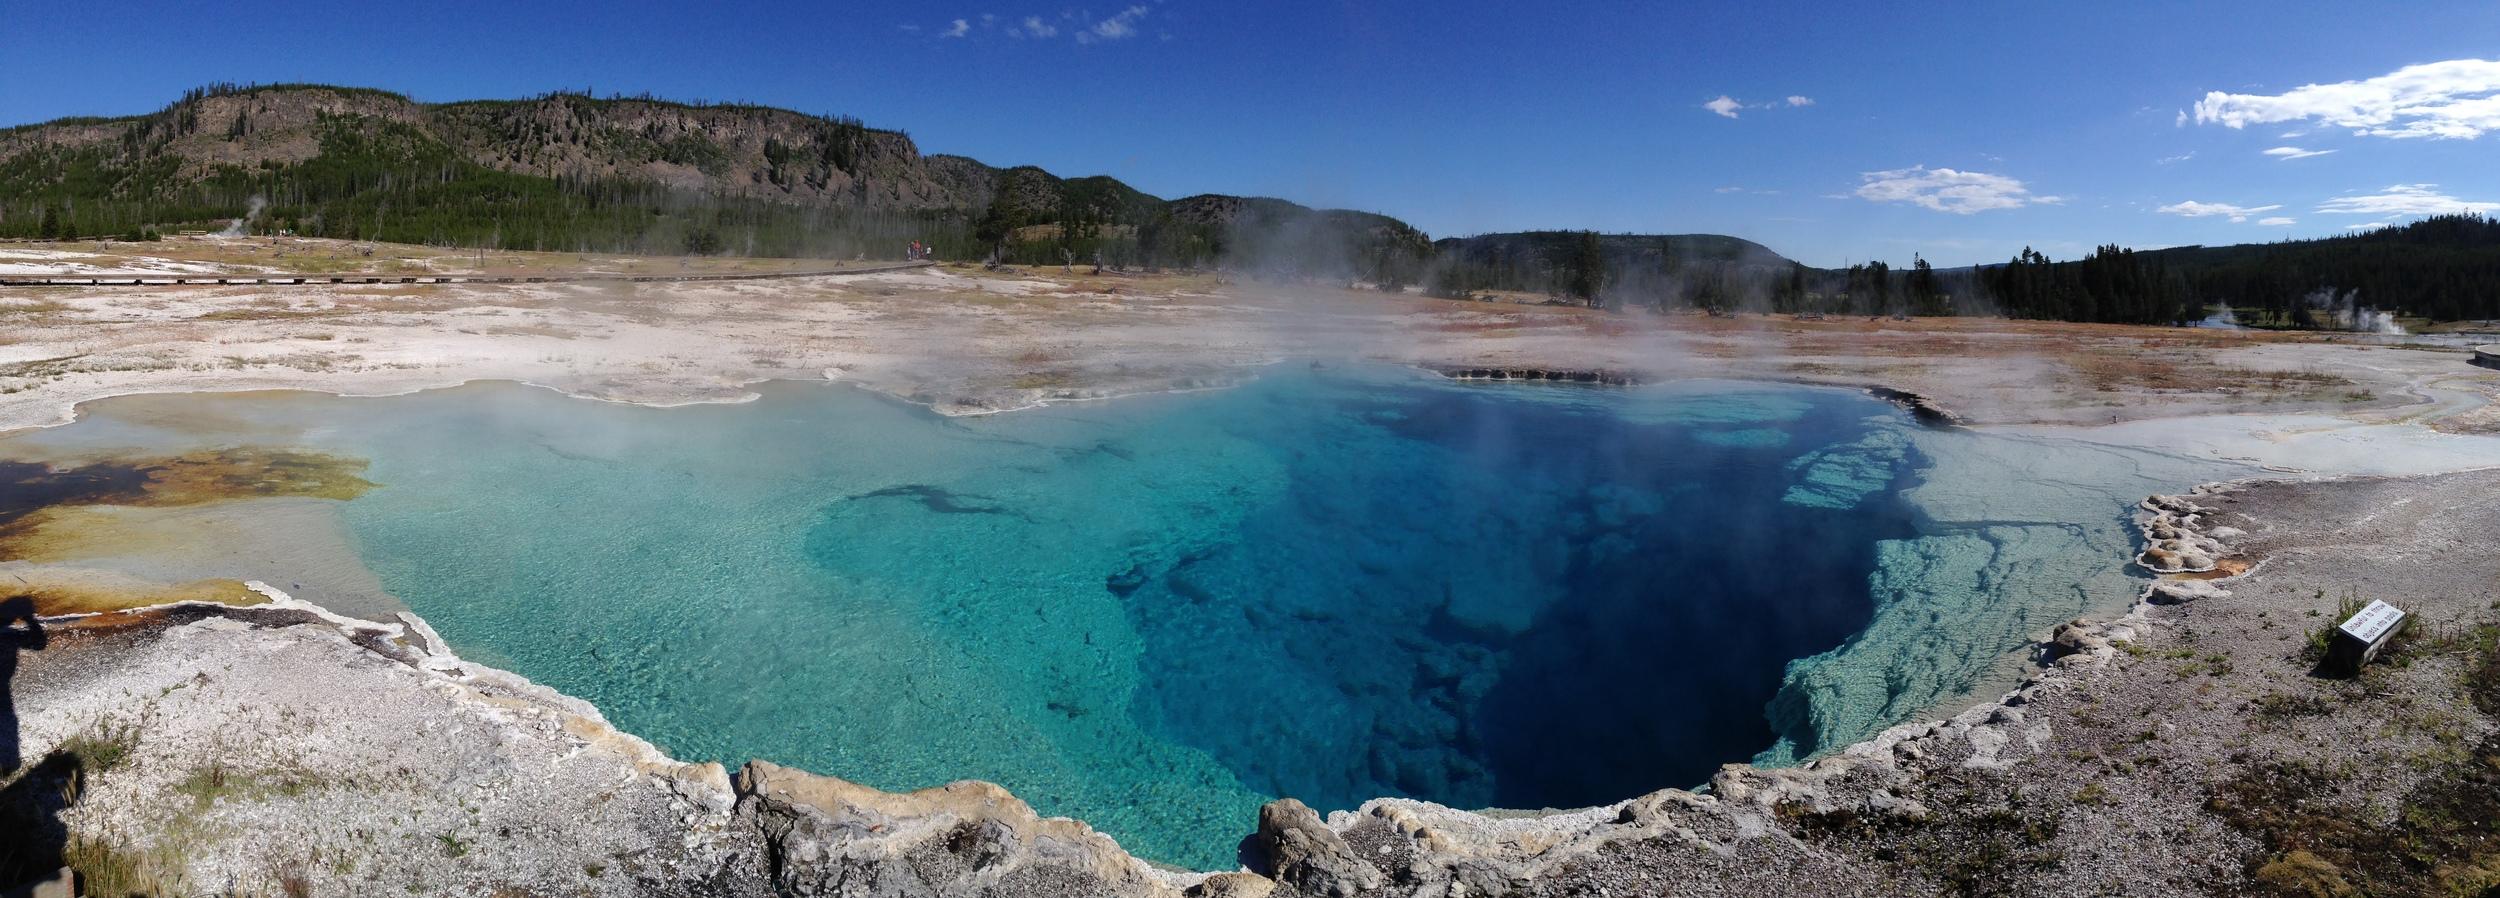 Blue Sapphire Pool